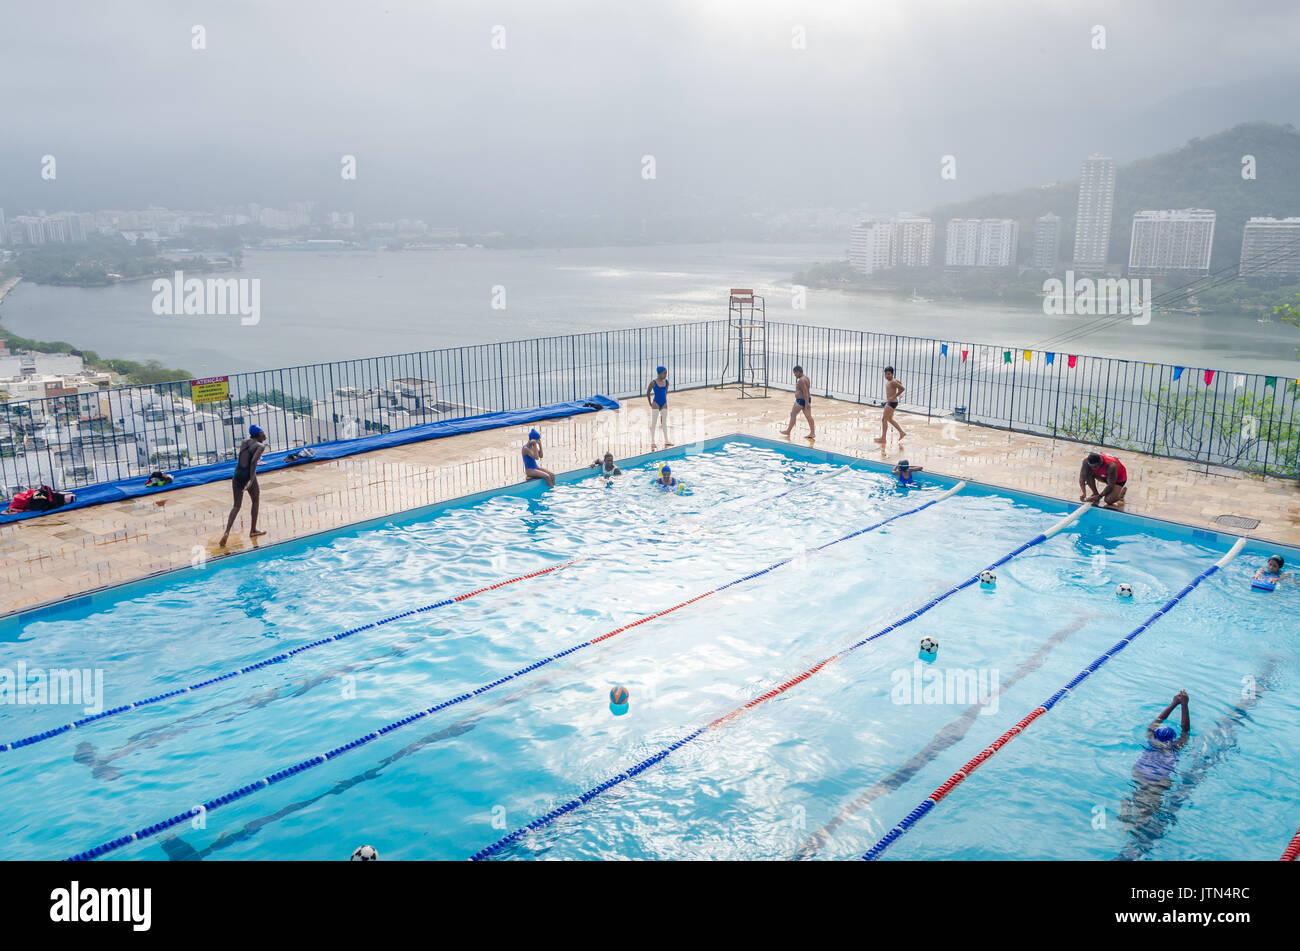 Swimming pool at Pavao Pavaozinho favela in Rio de Janeiro, Brazil Stock Photo